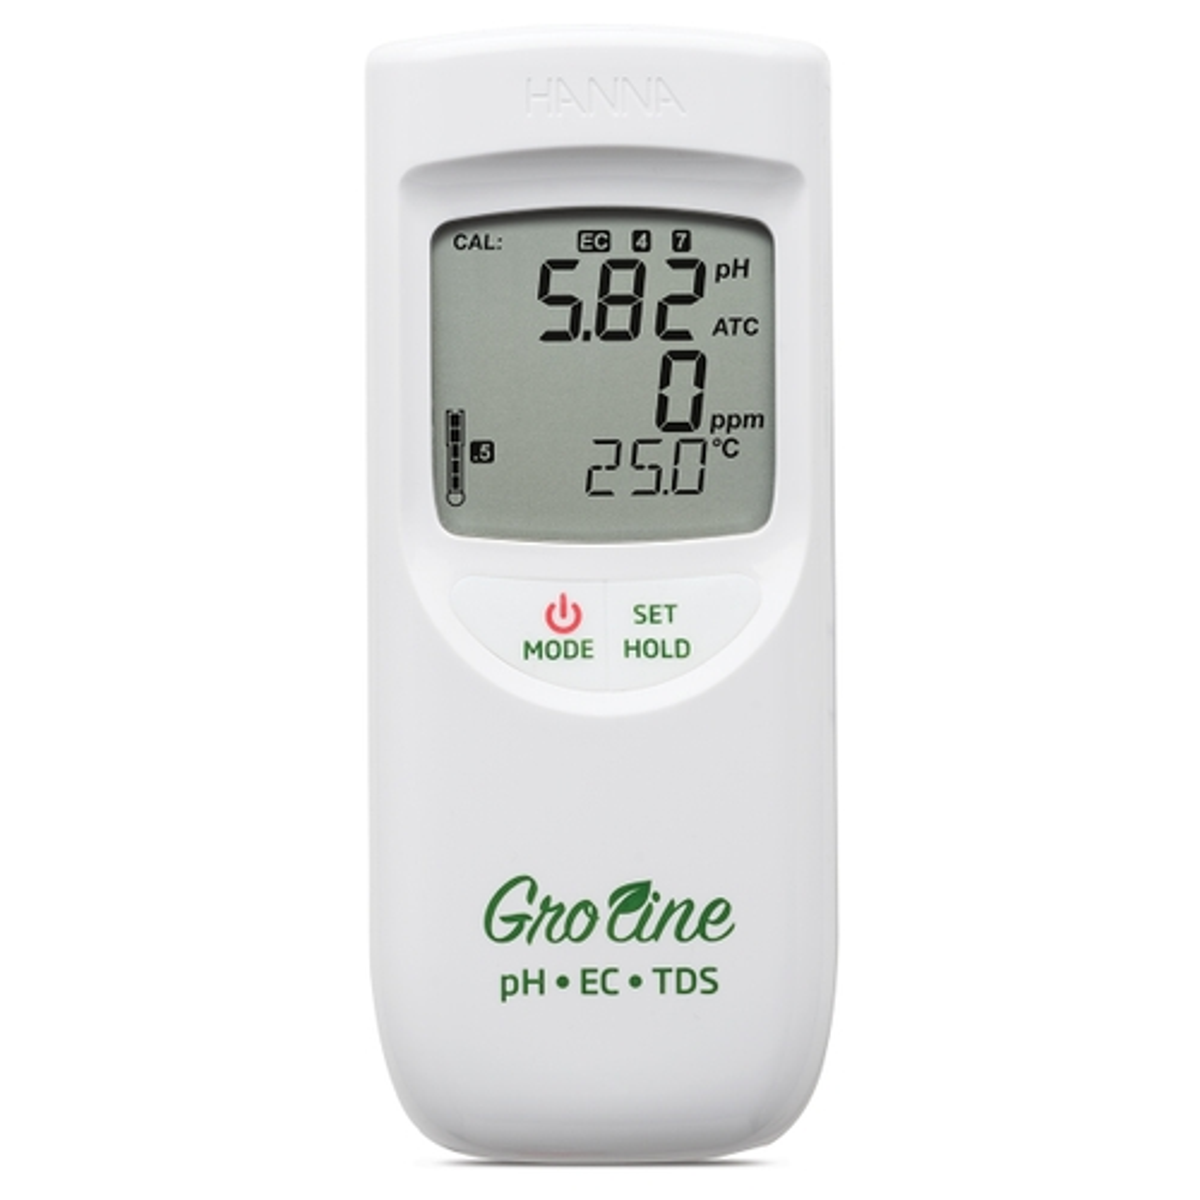 Groline Hydroponic Waterproof Portable pH/EC/TDS/Temperature Meter - HI9814